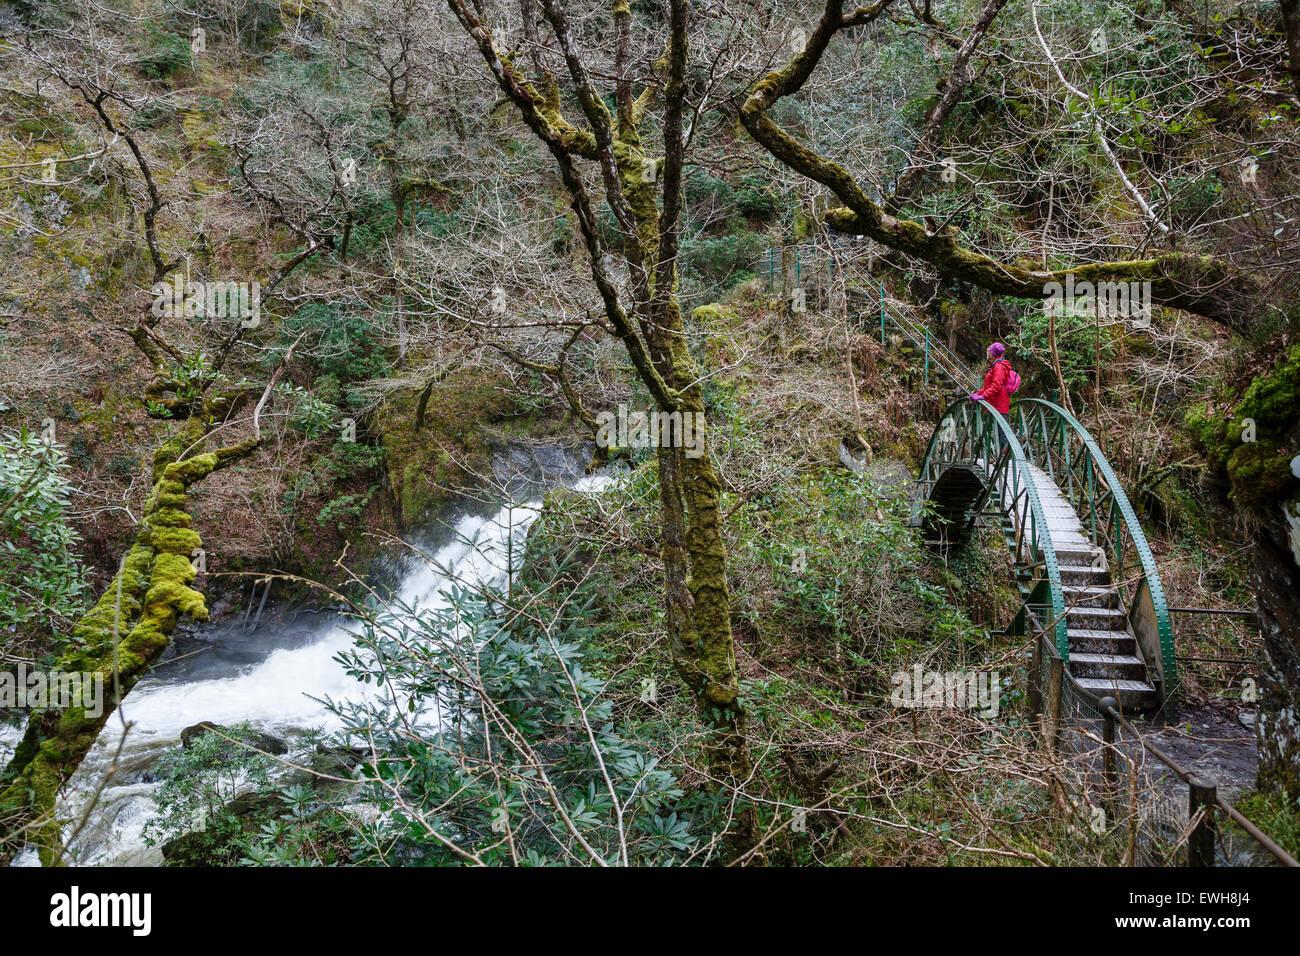 Footbridge over the Mynach Falls, Devil's Bridge, Rheidol Valley, Ceredigion, Wales - Stock Image